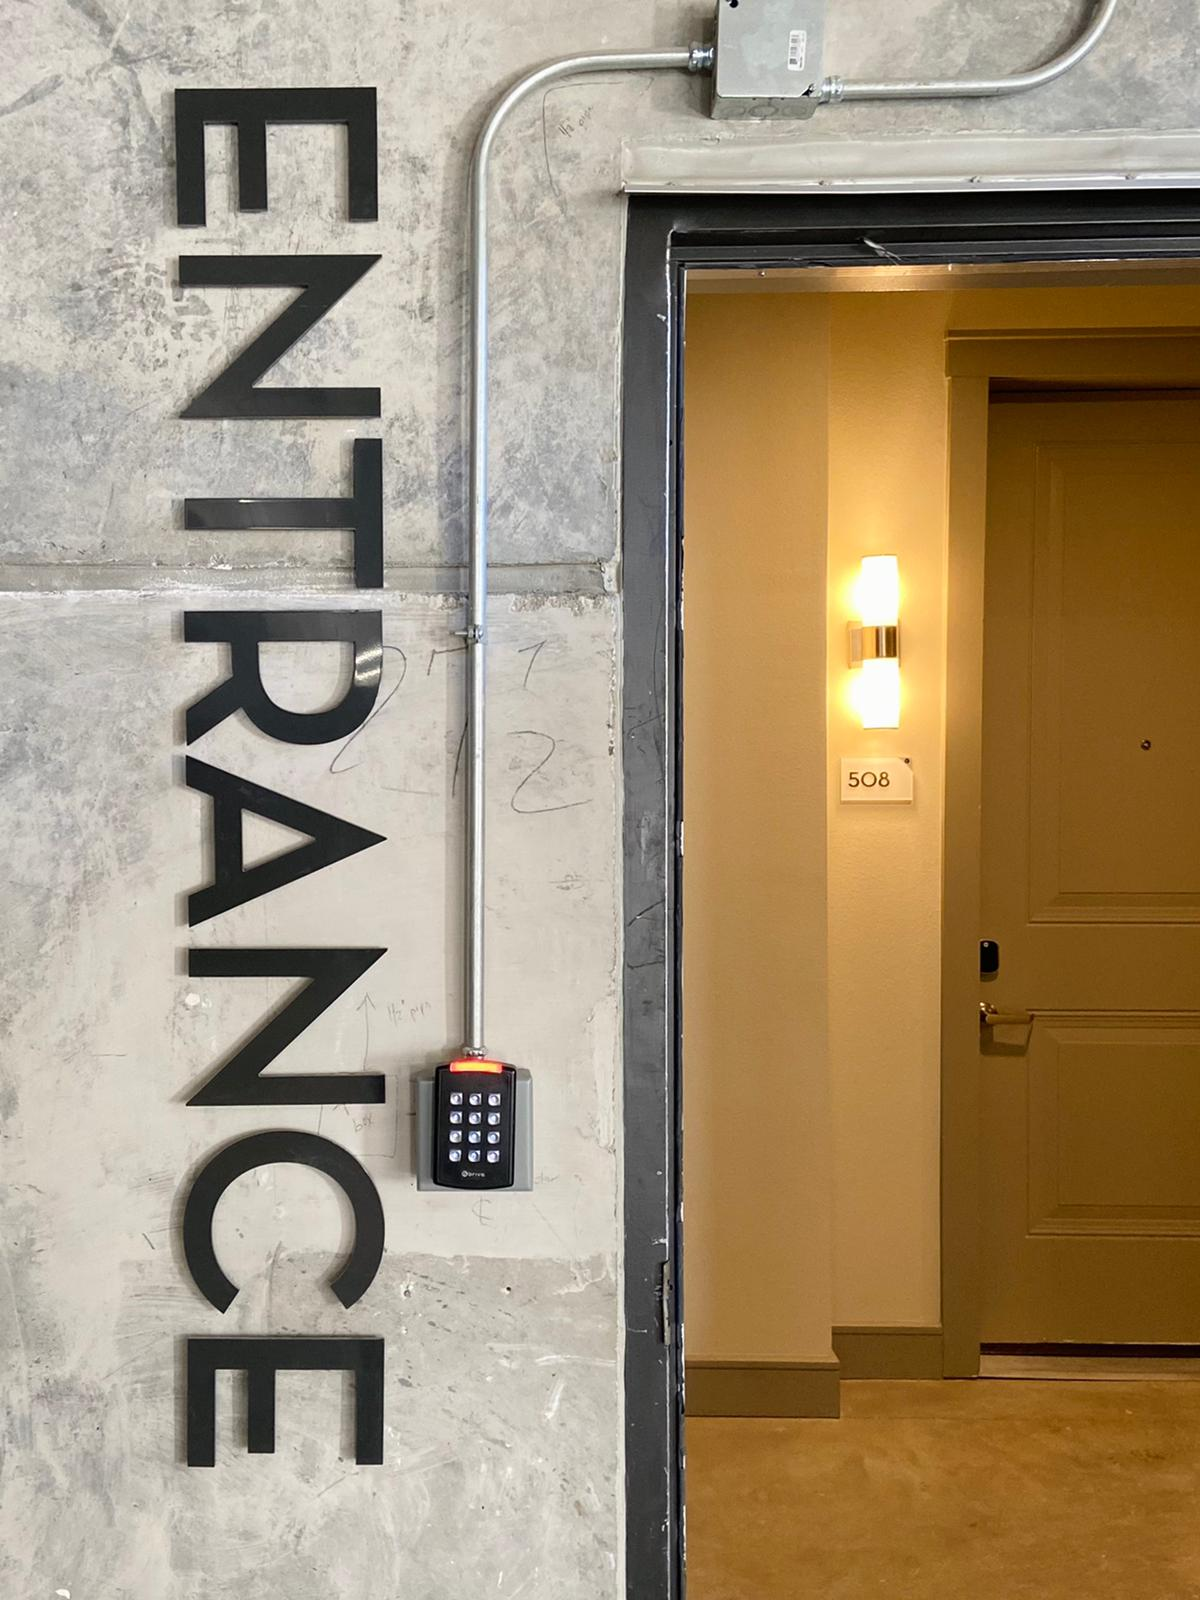 15 Building Entrance sign